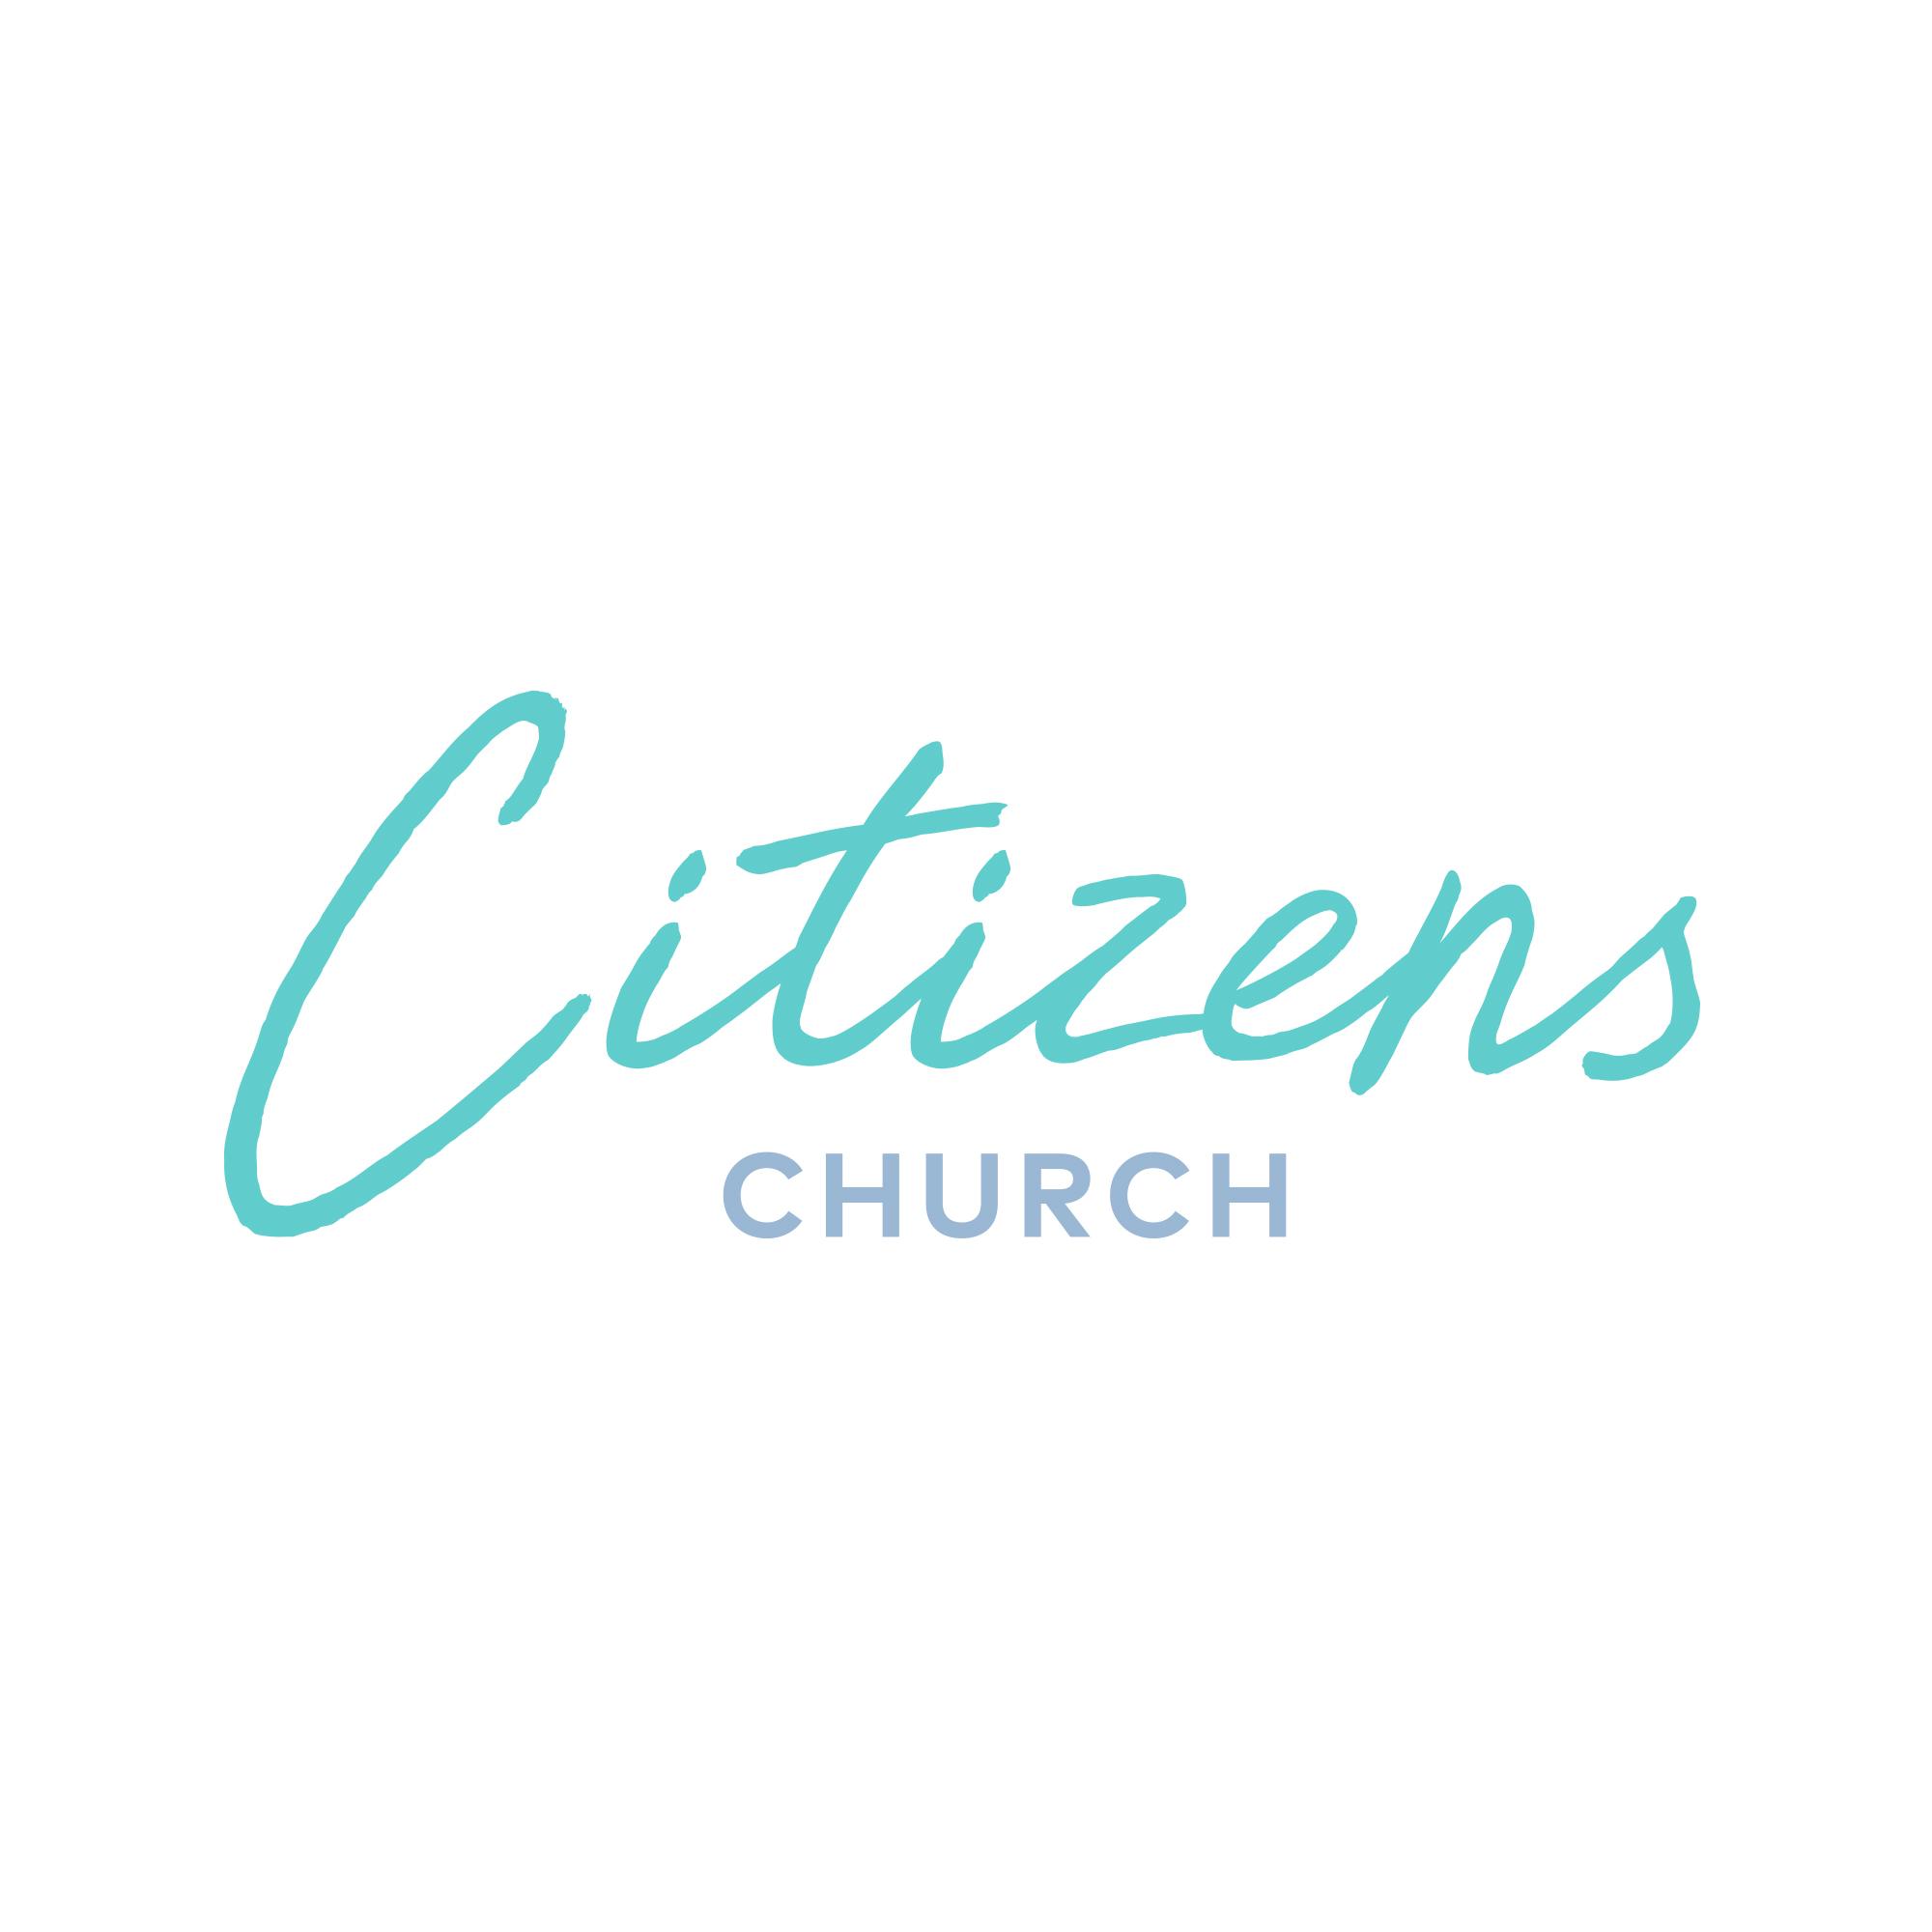 Copy of Citizen Church, Canada